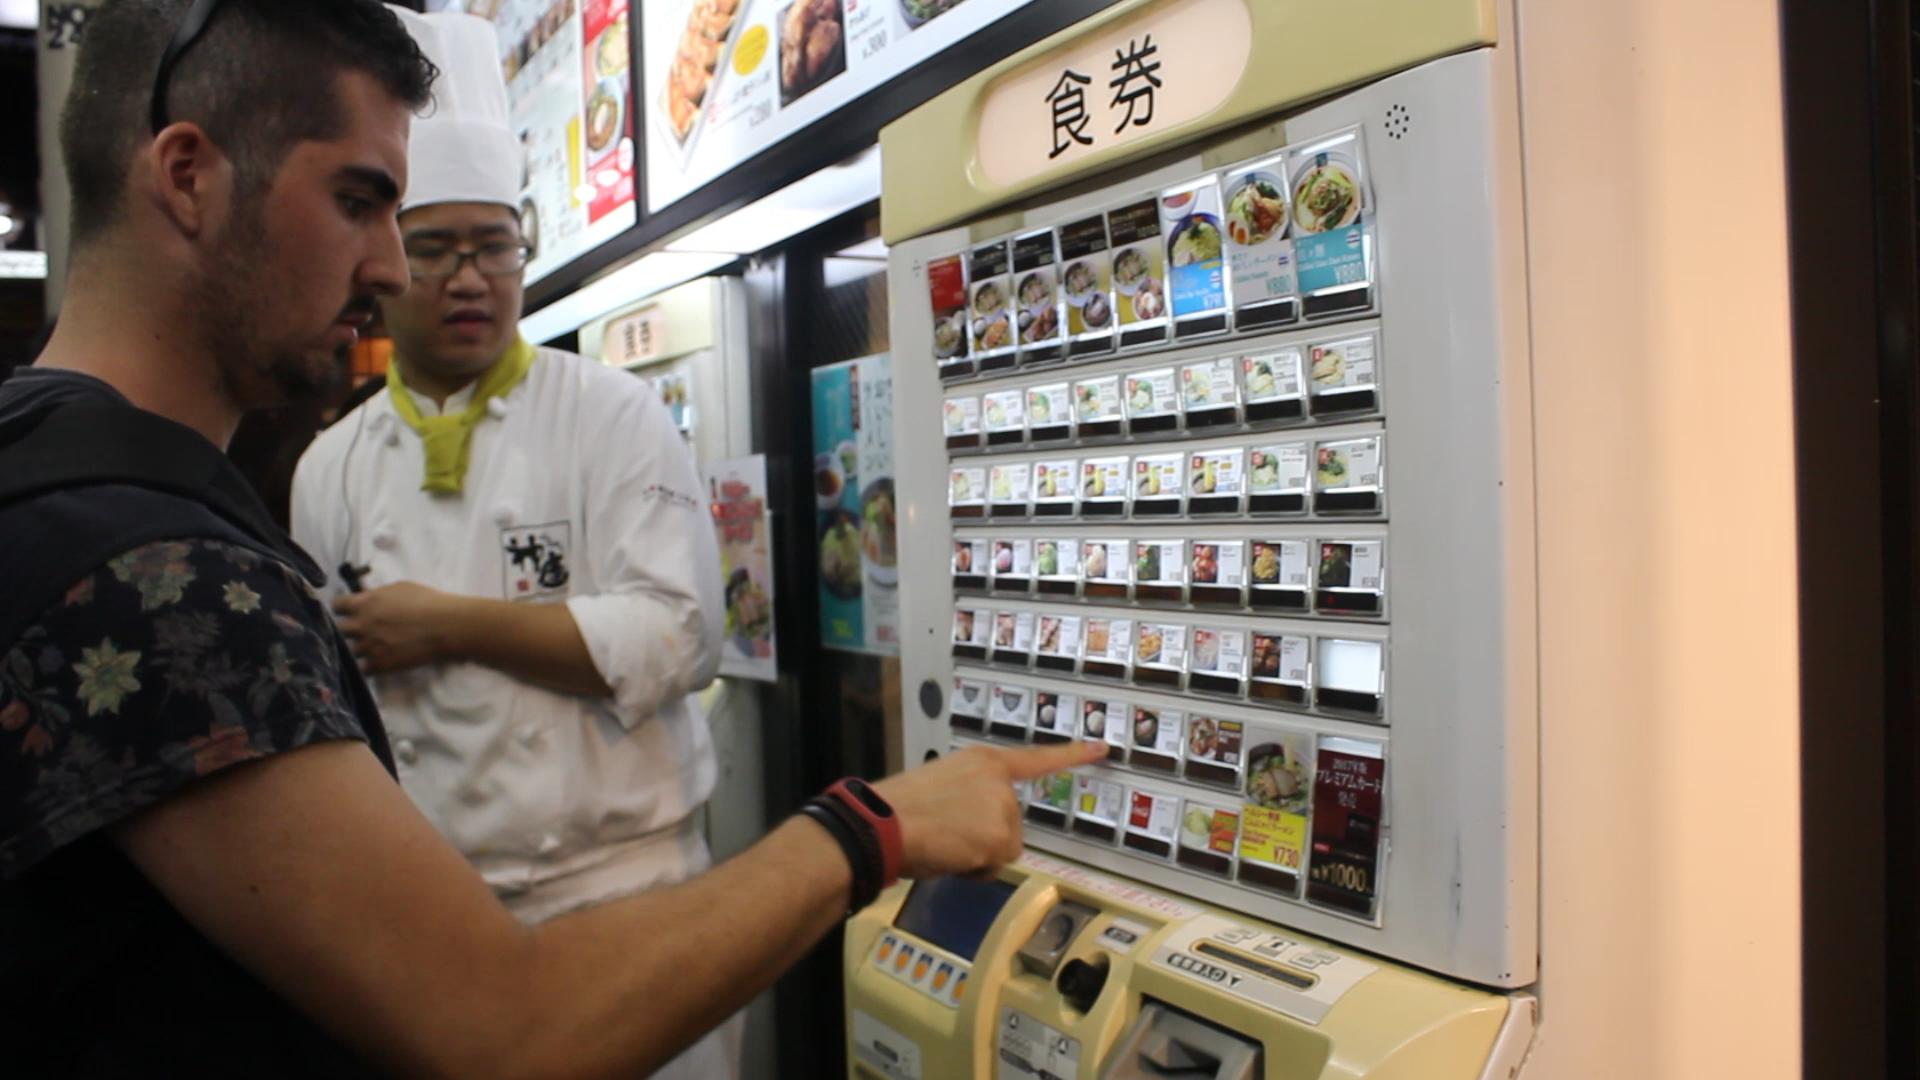 maquina comida tokyo